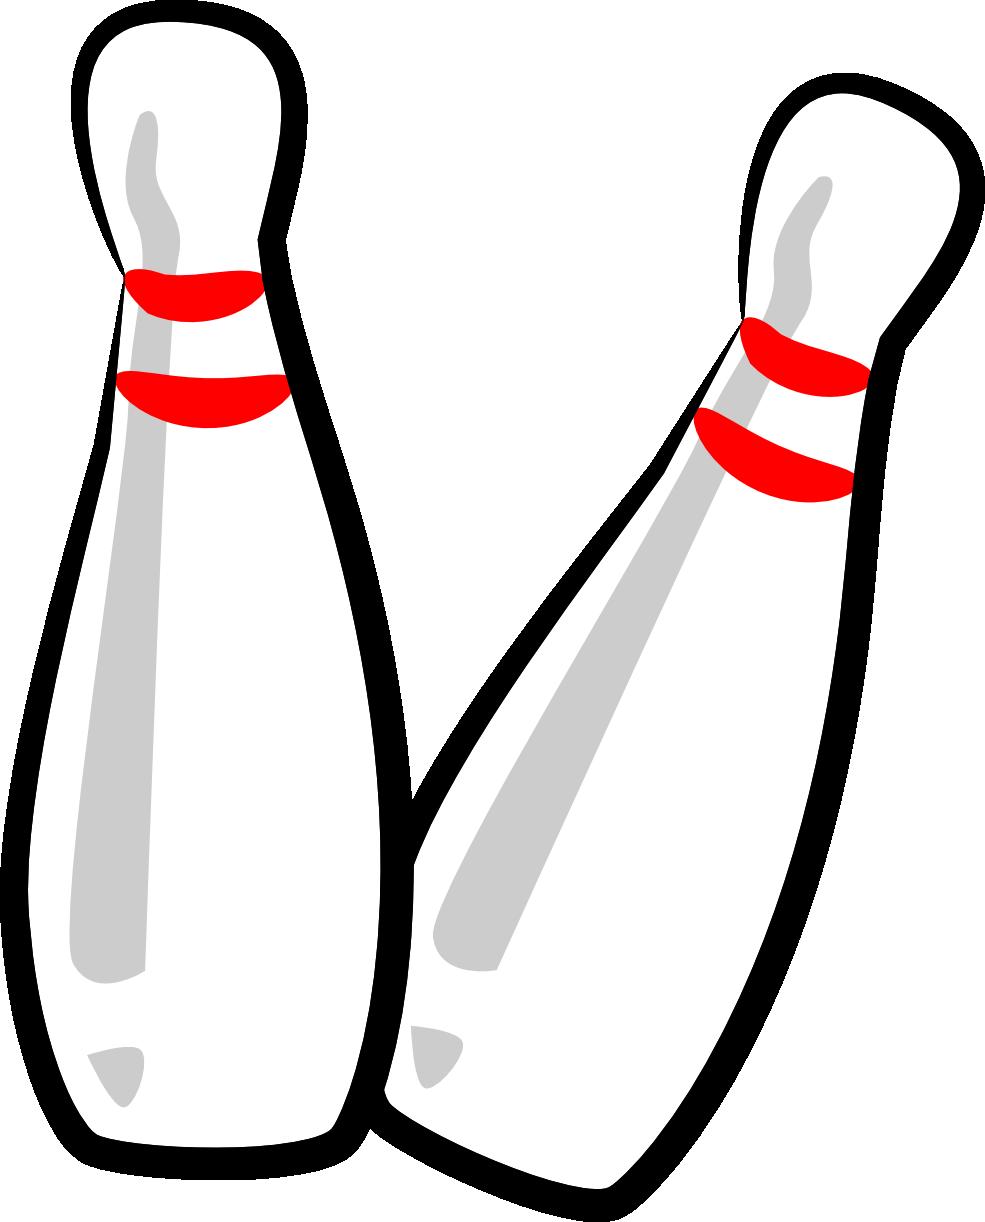 Retro clipart bowling pin #2